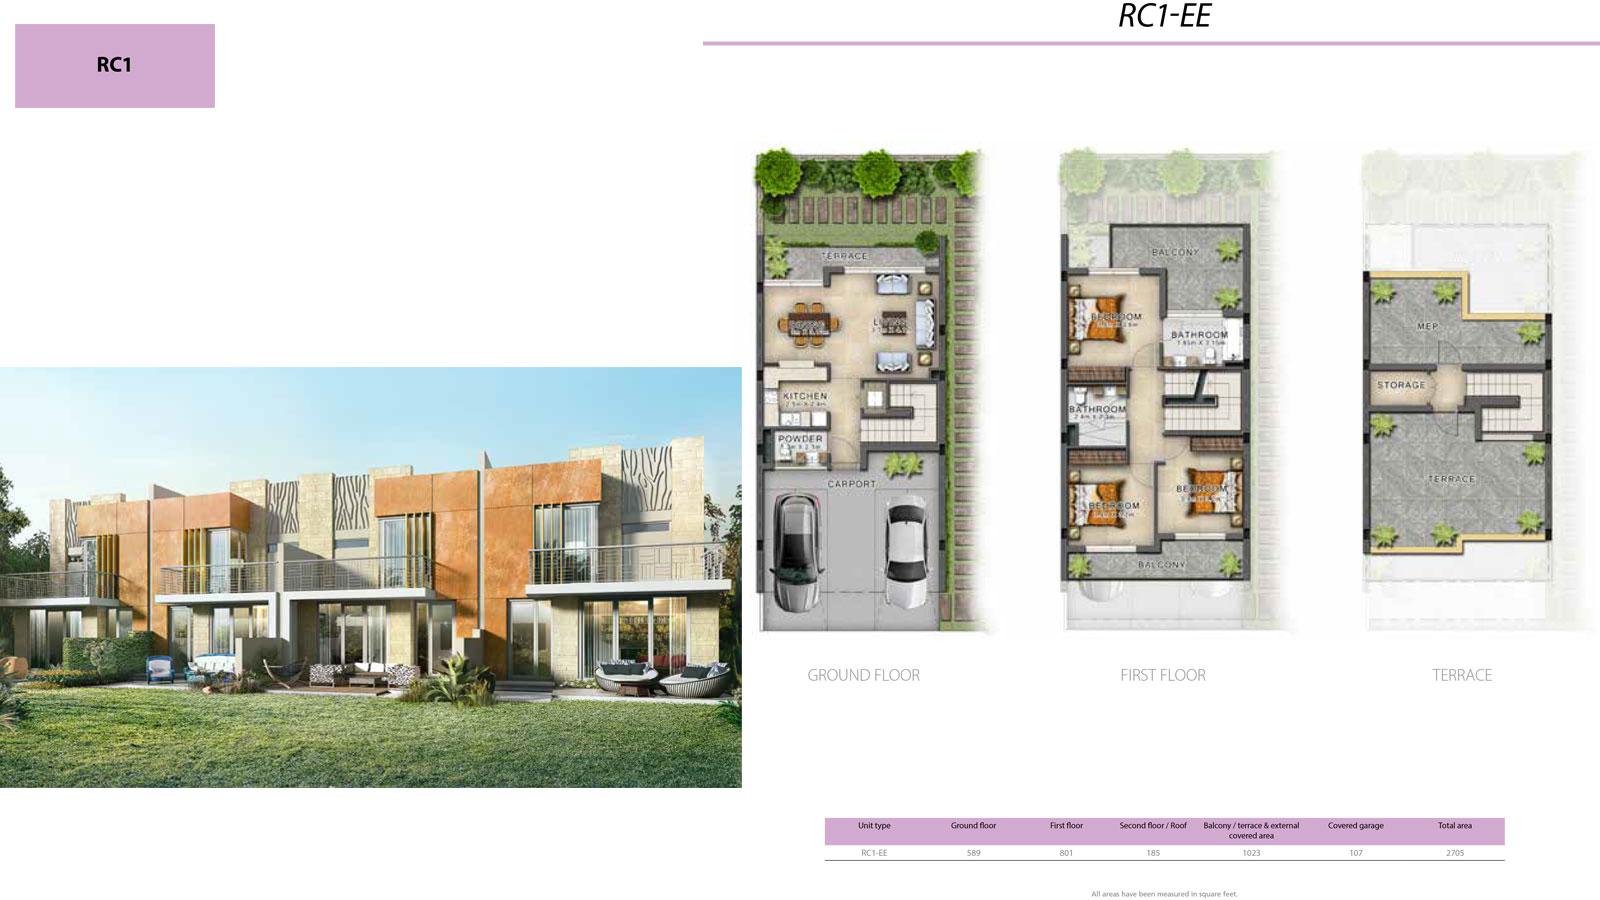 3 BR RC1            (RC1-EE, 3 Bedroom Villa, Size 2705 sq ft)